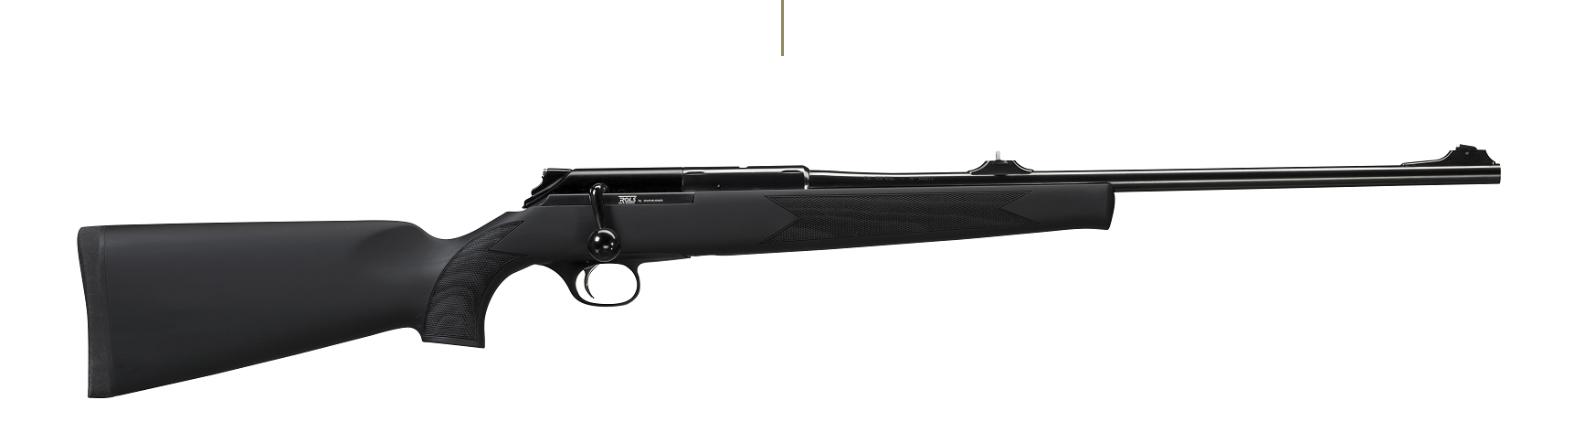 chapuis rols soft touch carabina da caccia